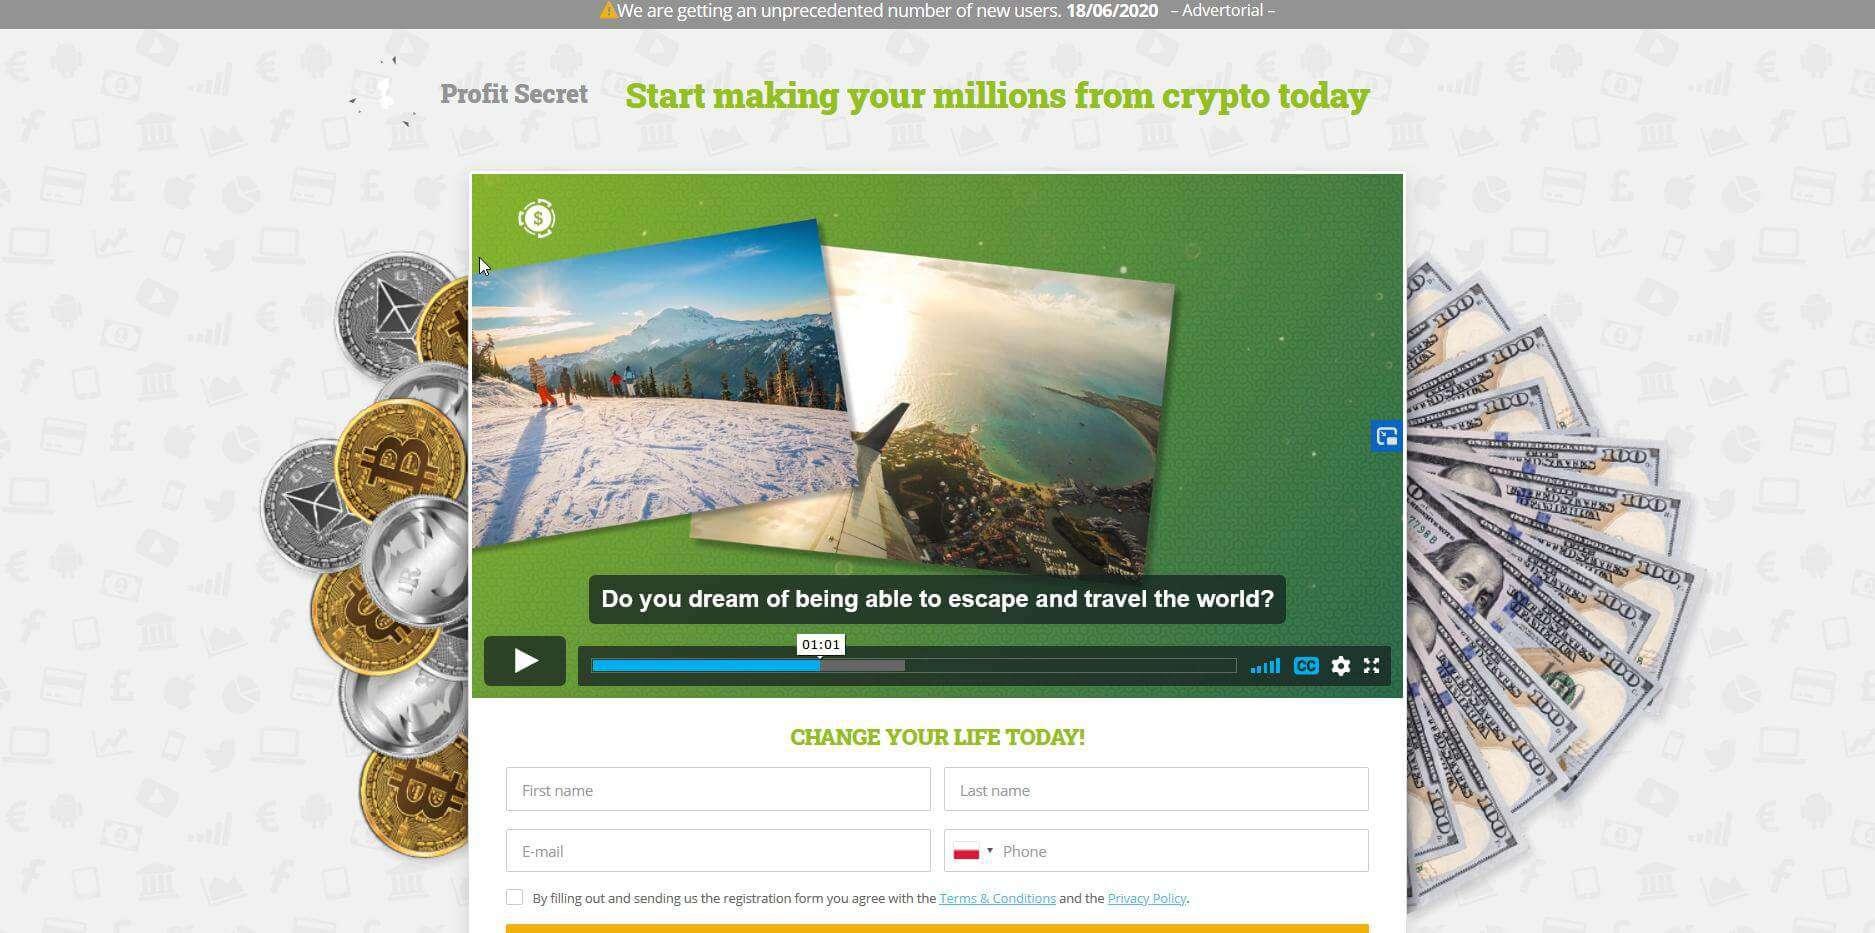 Homepagina van Profit Secret